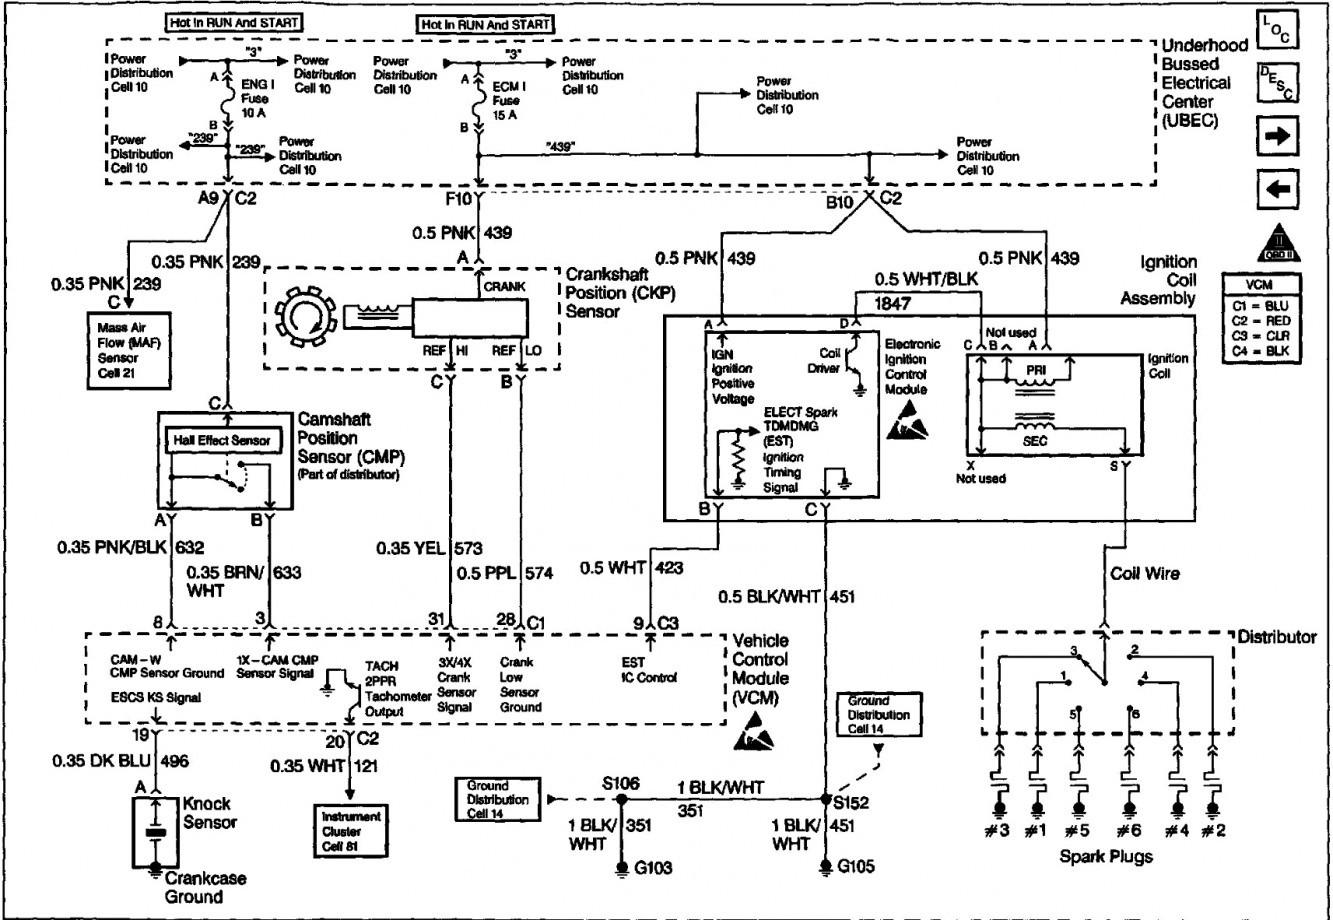 Wonderful star Wiring Diagram 2019 Electricalwiringcircuit Me star Questions star Fmv Mirror Wiring Diagram